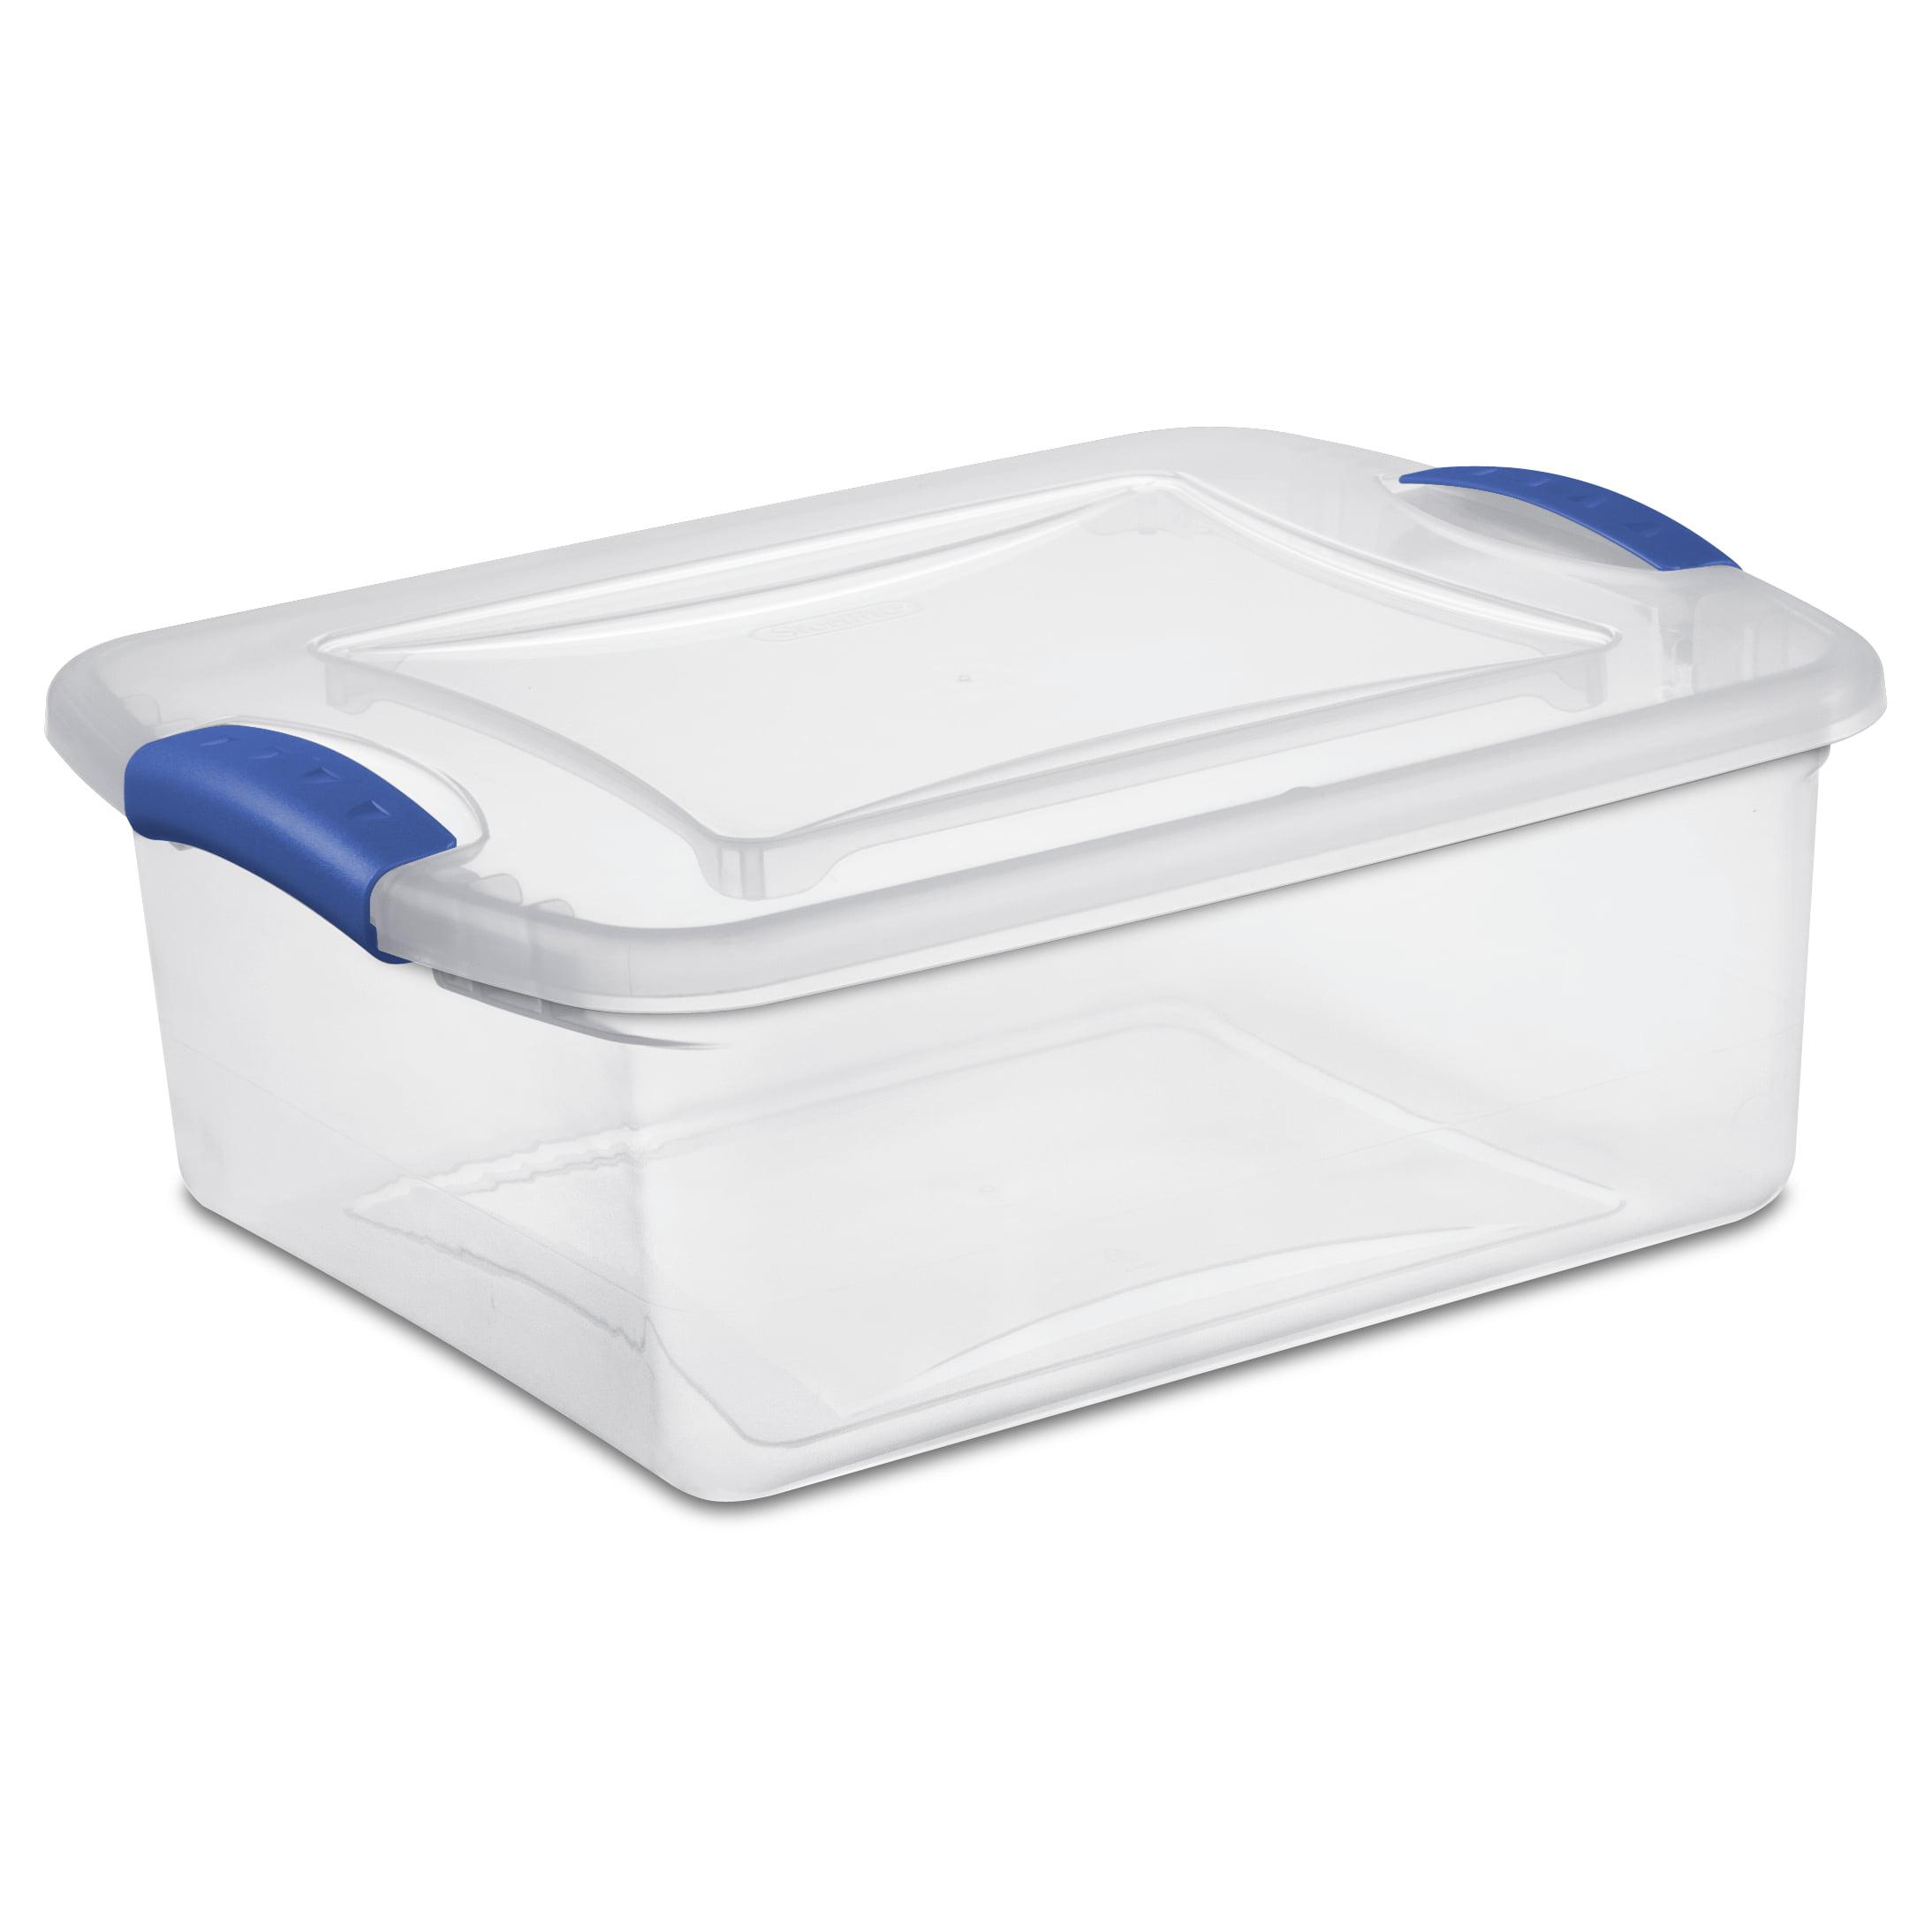 Sterilite 15 Quart Stadium Blue Latch Box, 2 Piece